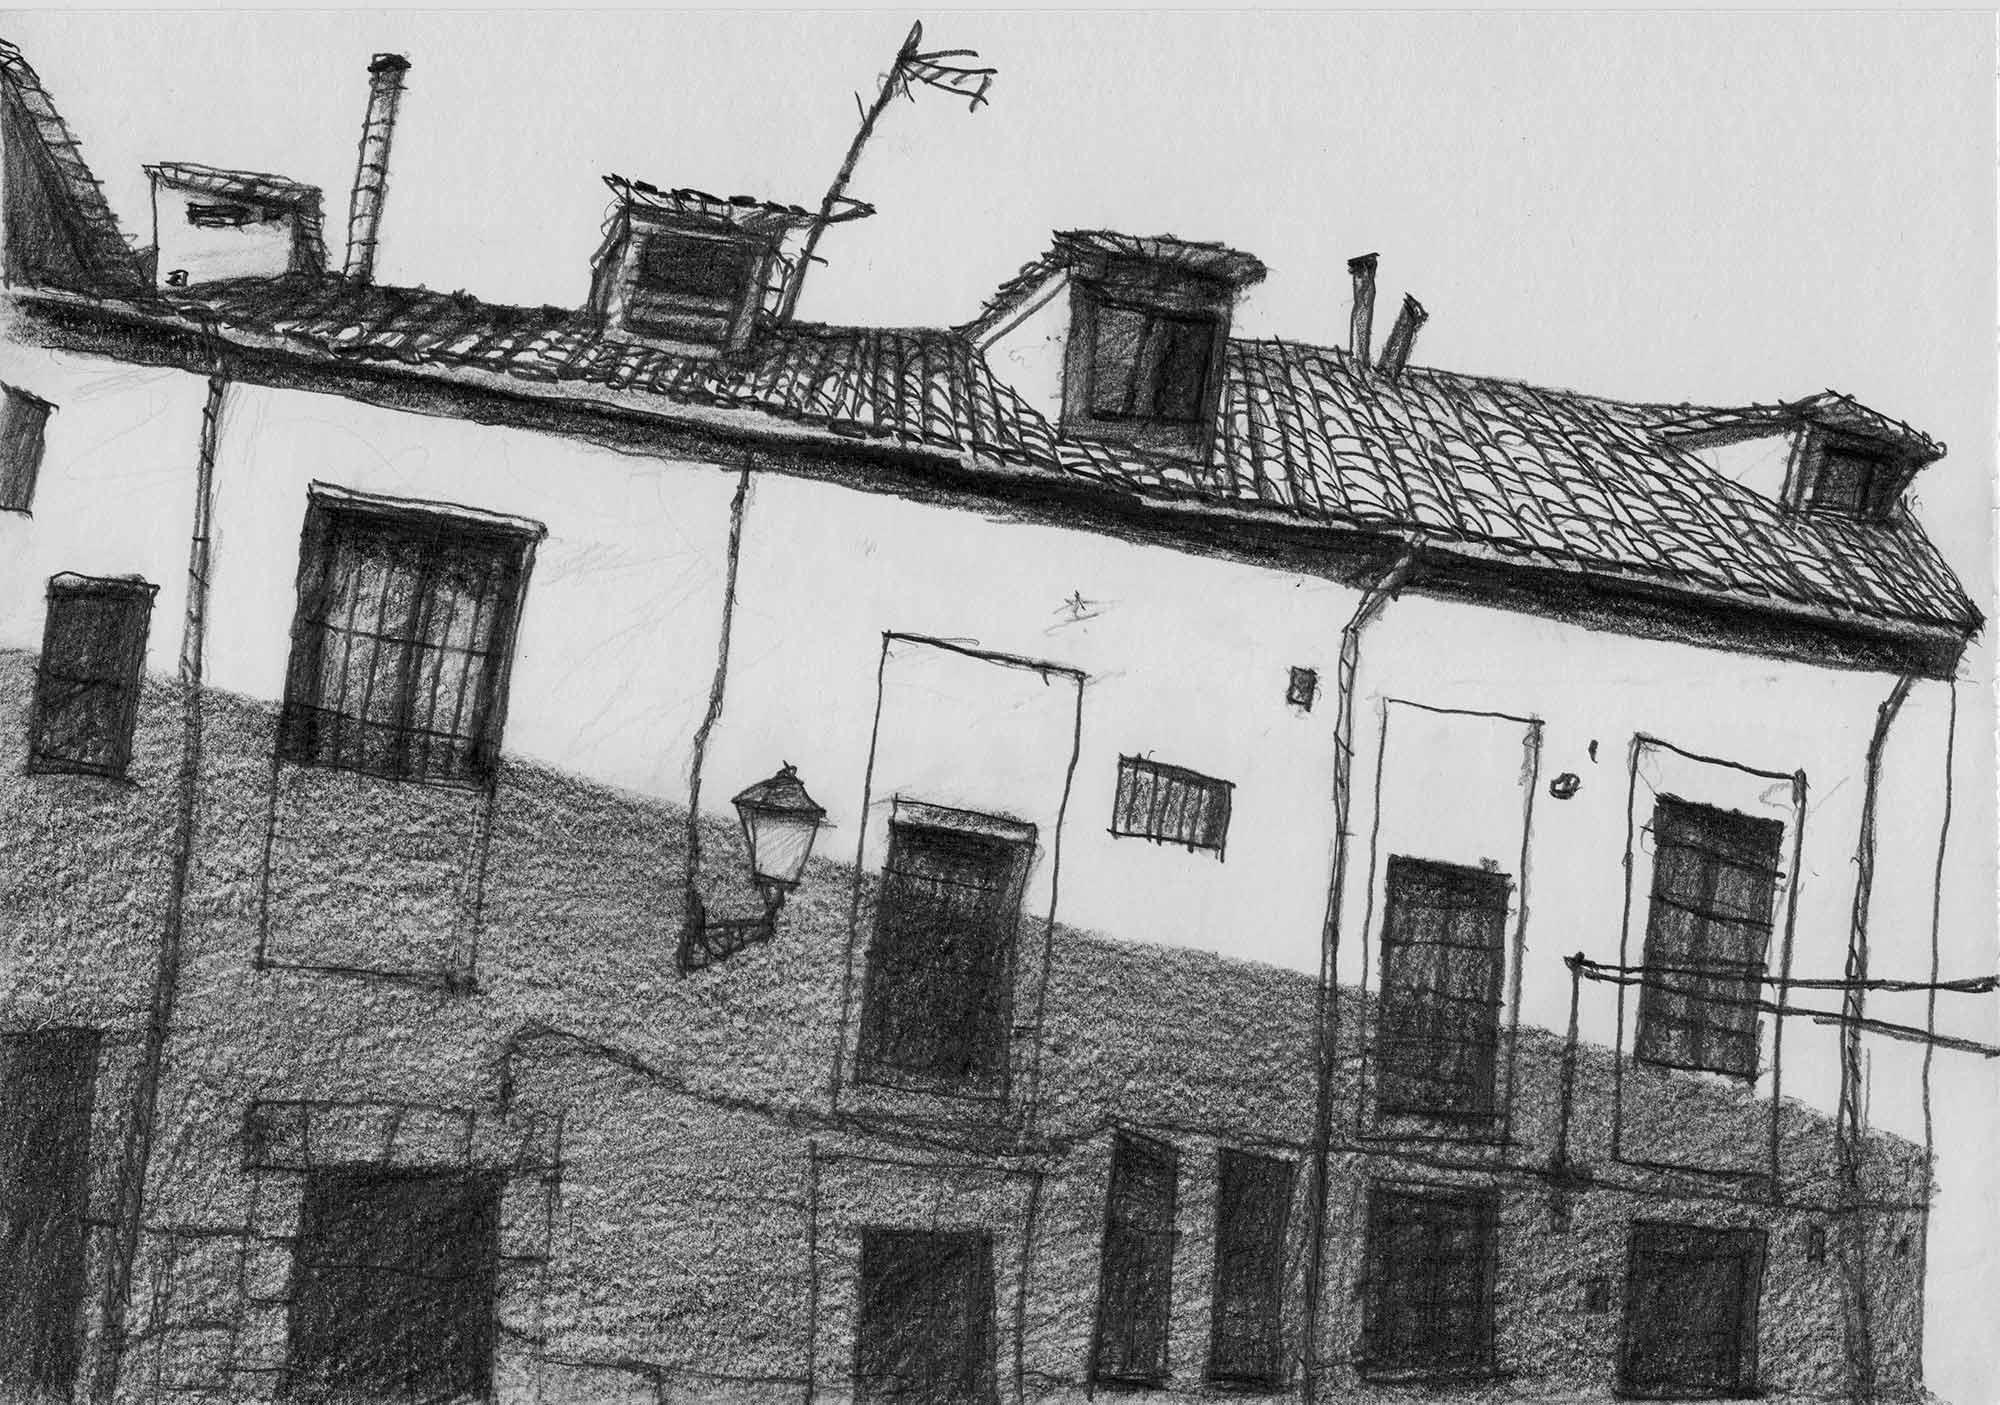 Roofs. Drawing. Pencil on paper. Mario Jodra 2020